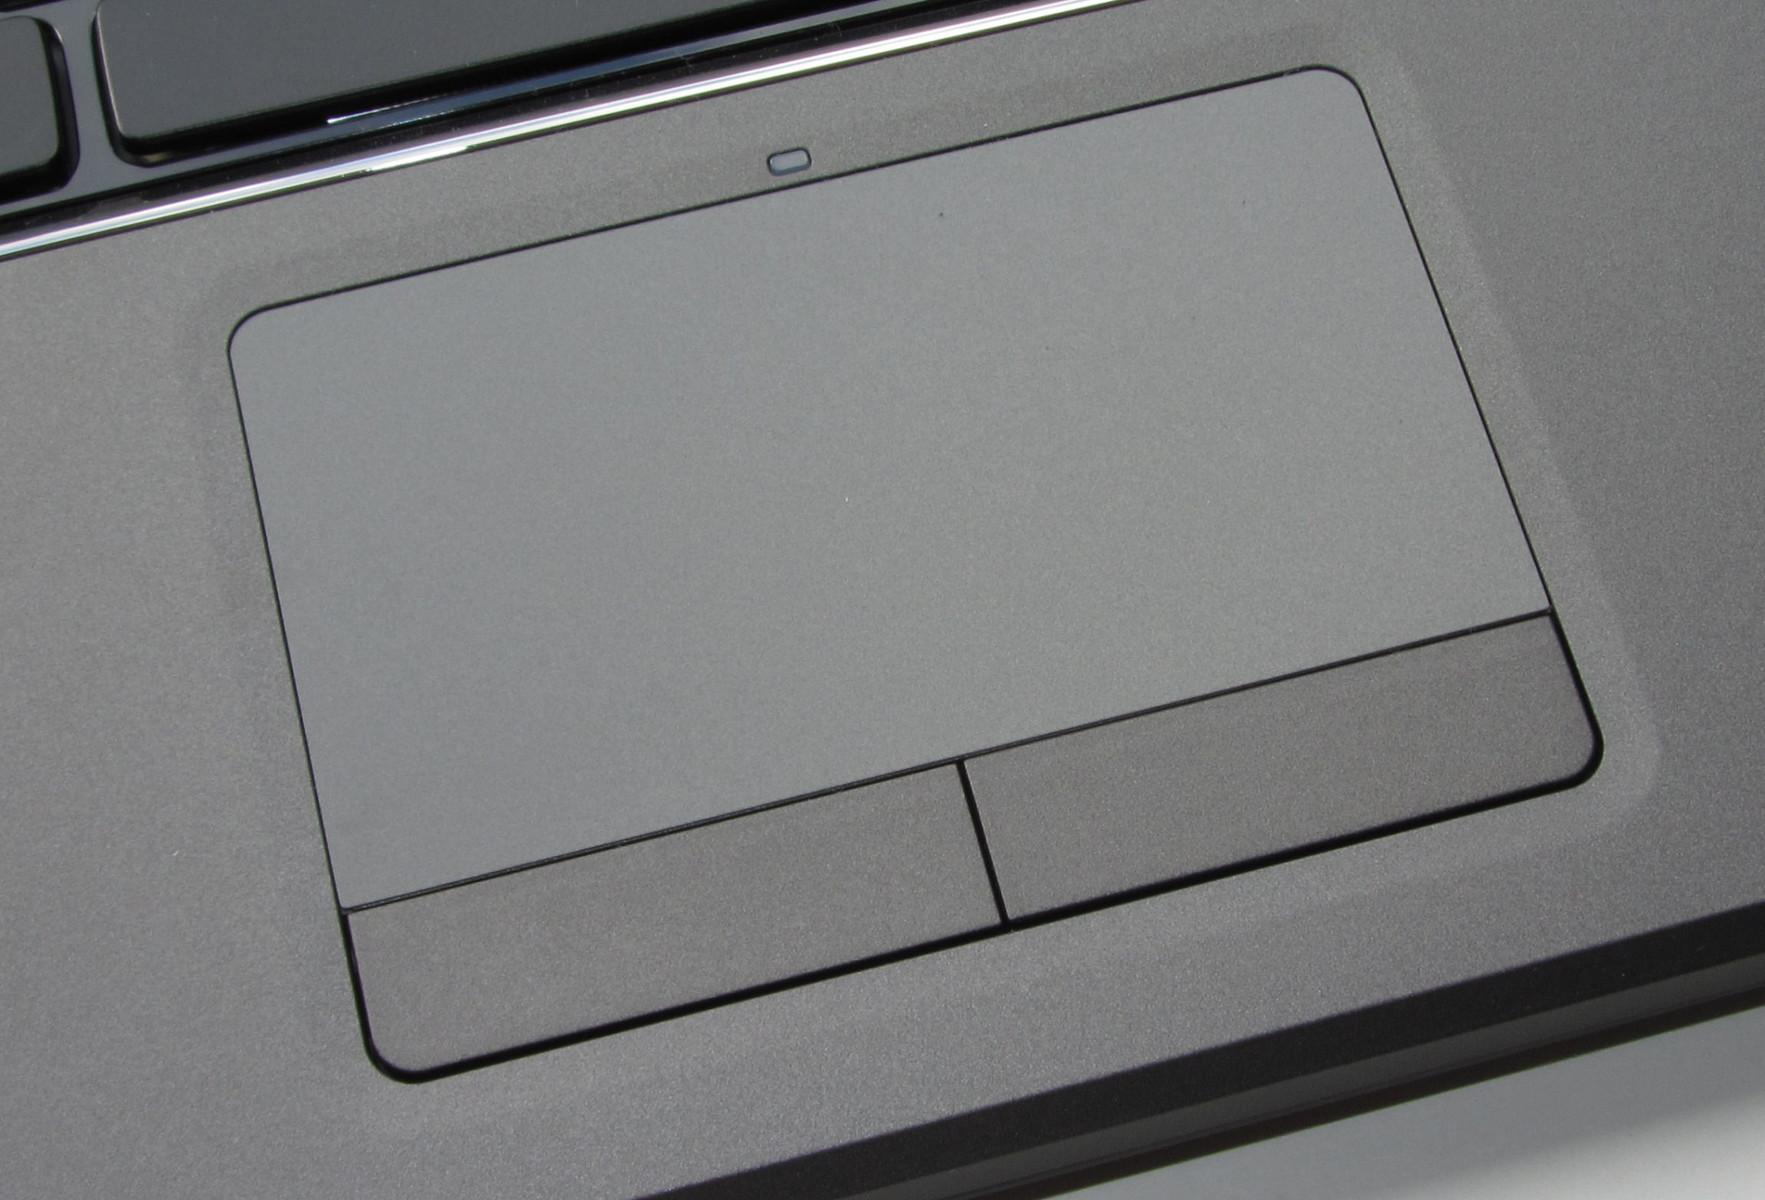 Touchpad de un ordenador portátil